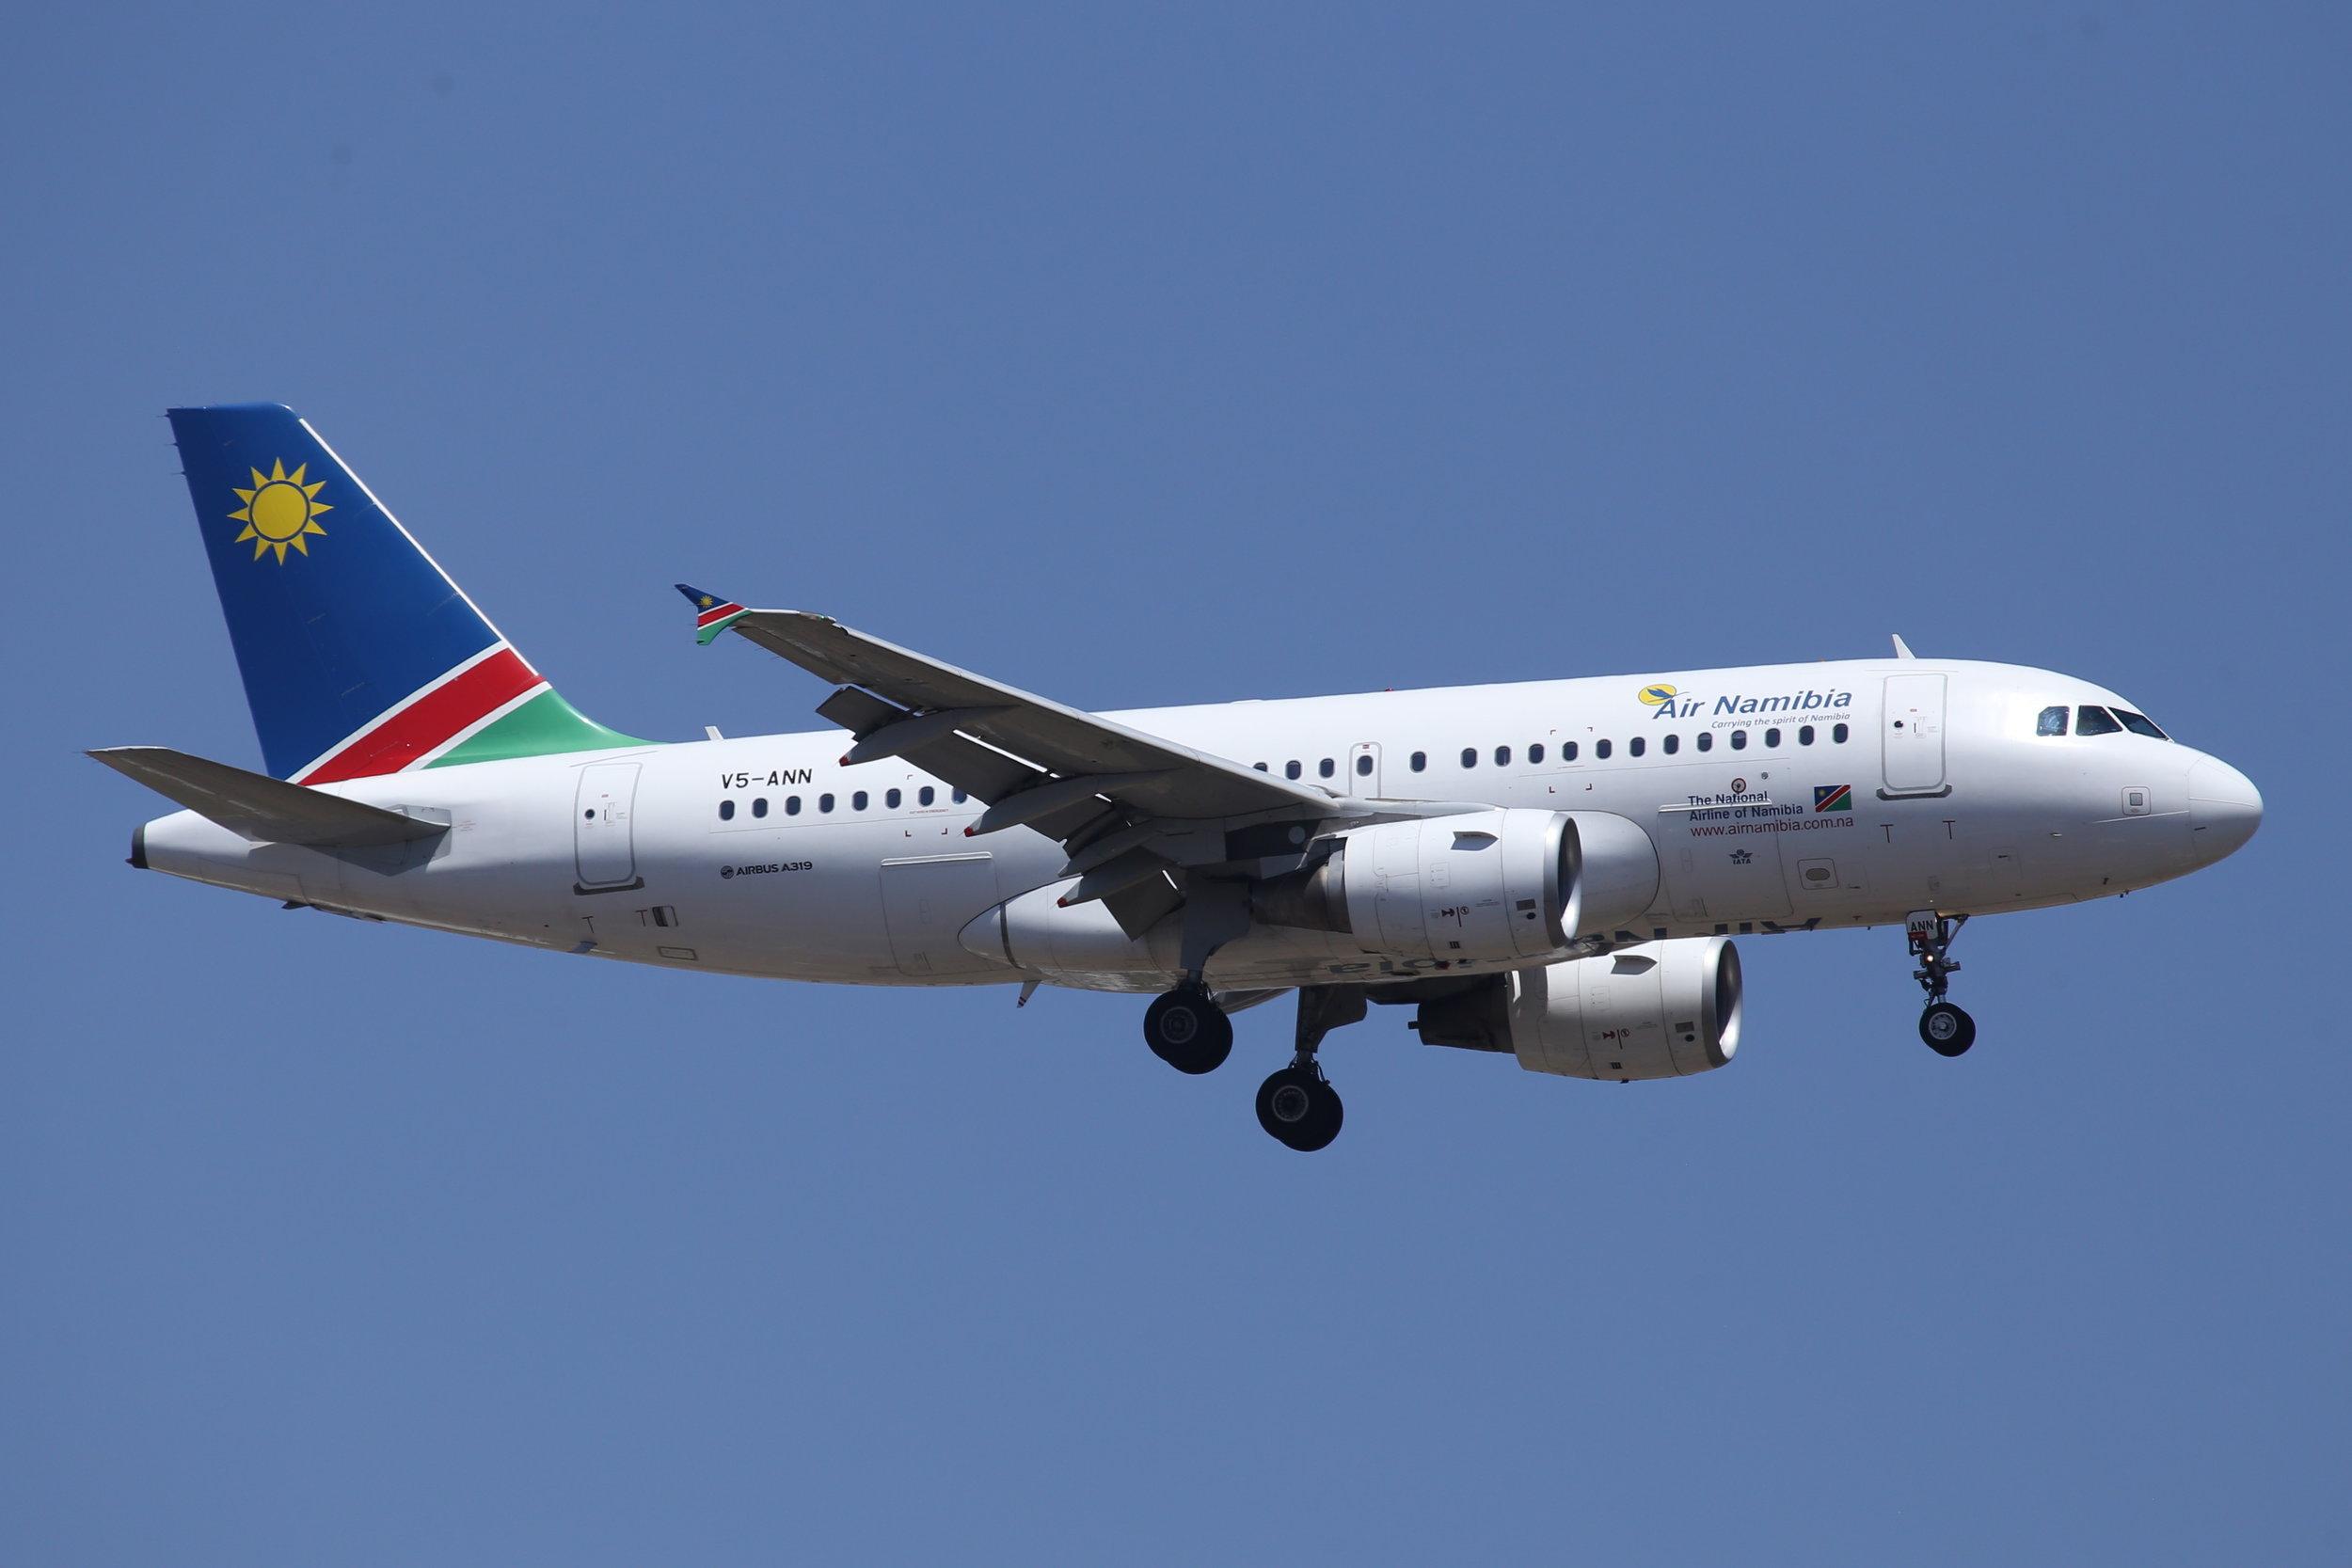 V5-ANN Air Namibia A319 taken at Johannesburg 10th November 2018 by John Wood